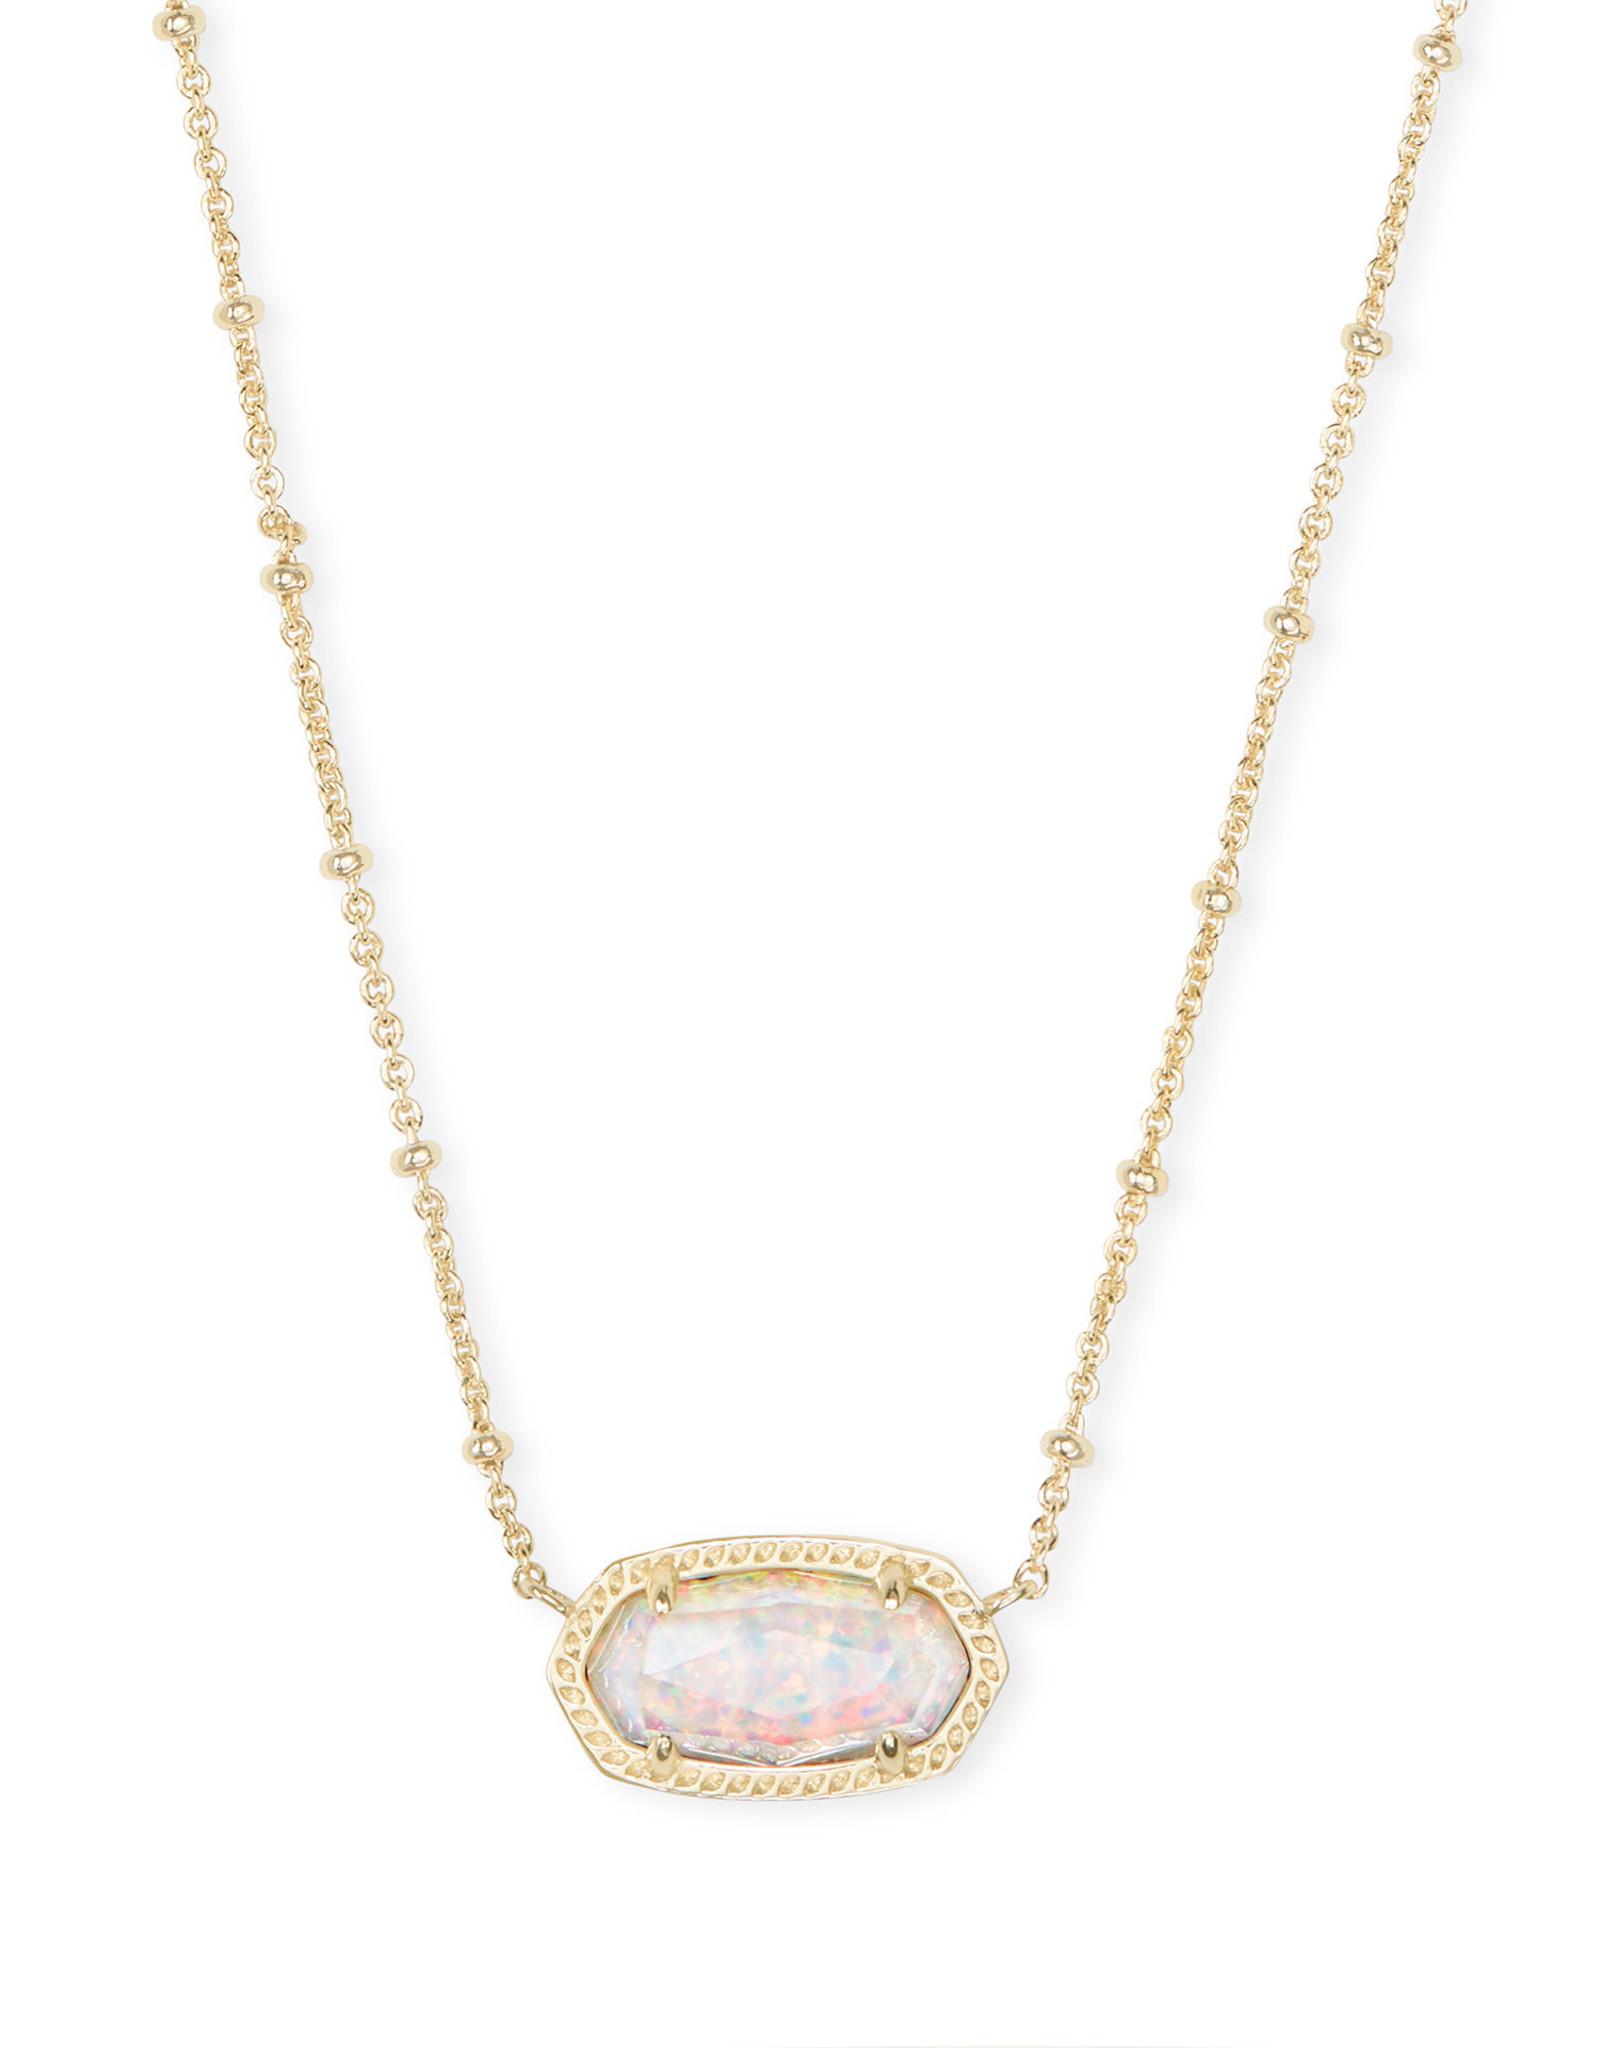 Kendra Scott Elisa Satellite Short Necklace - White Opal/Gold